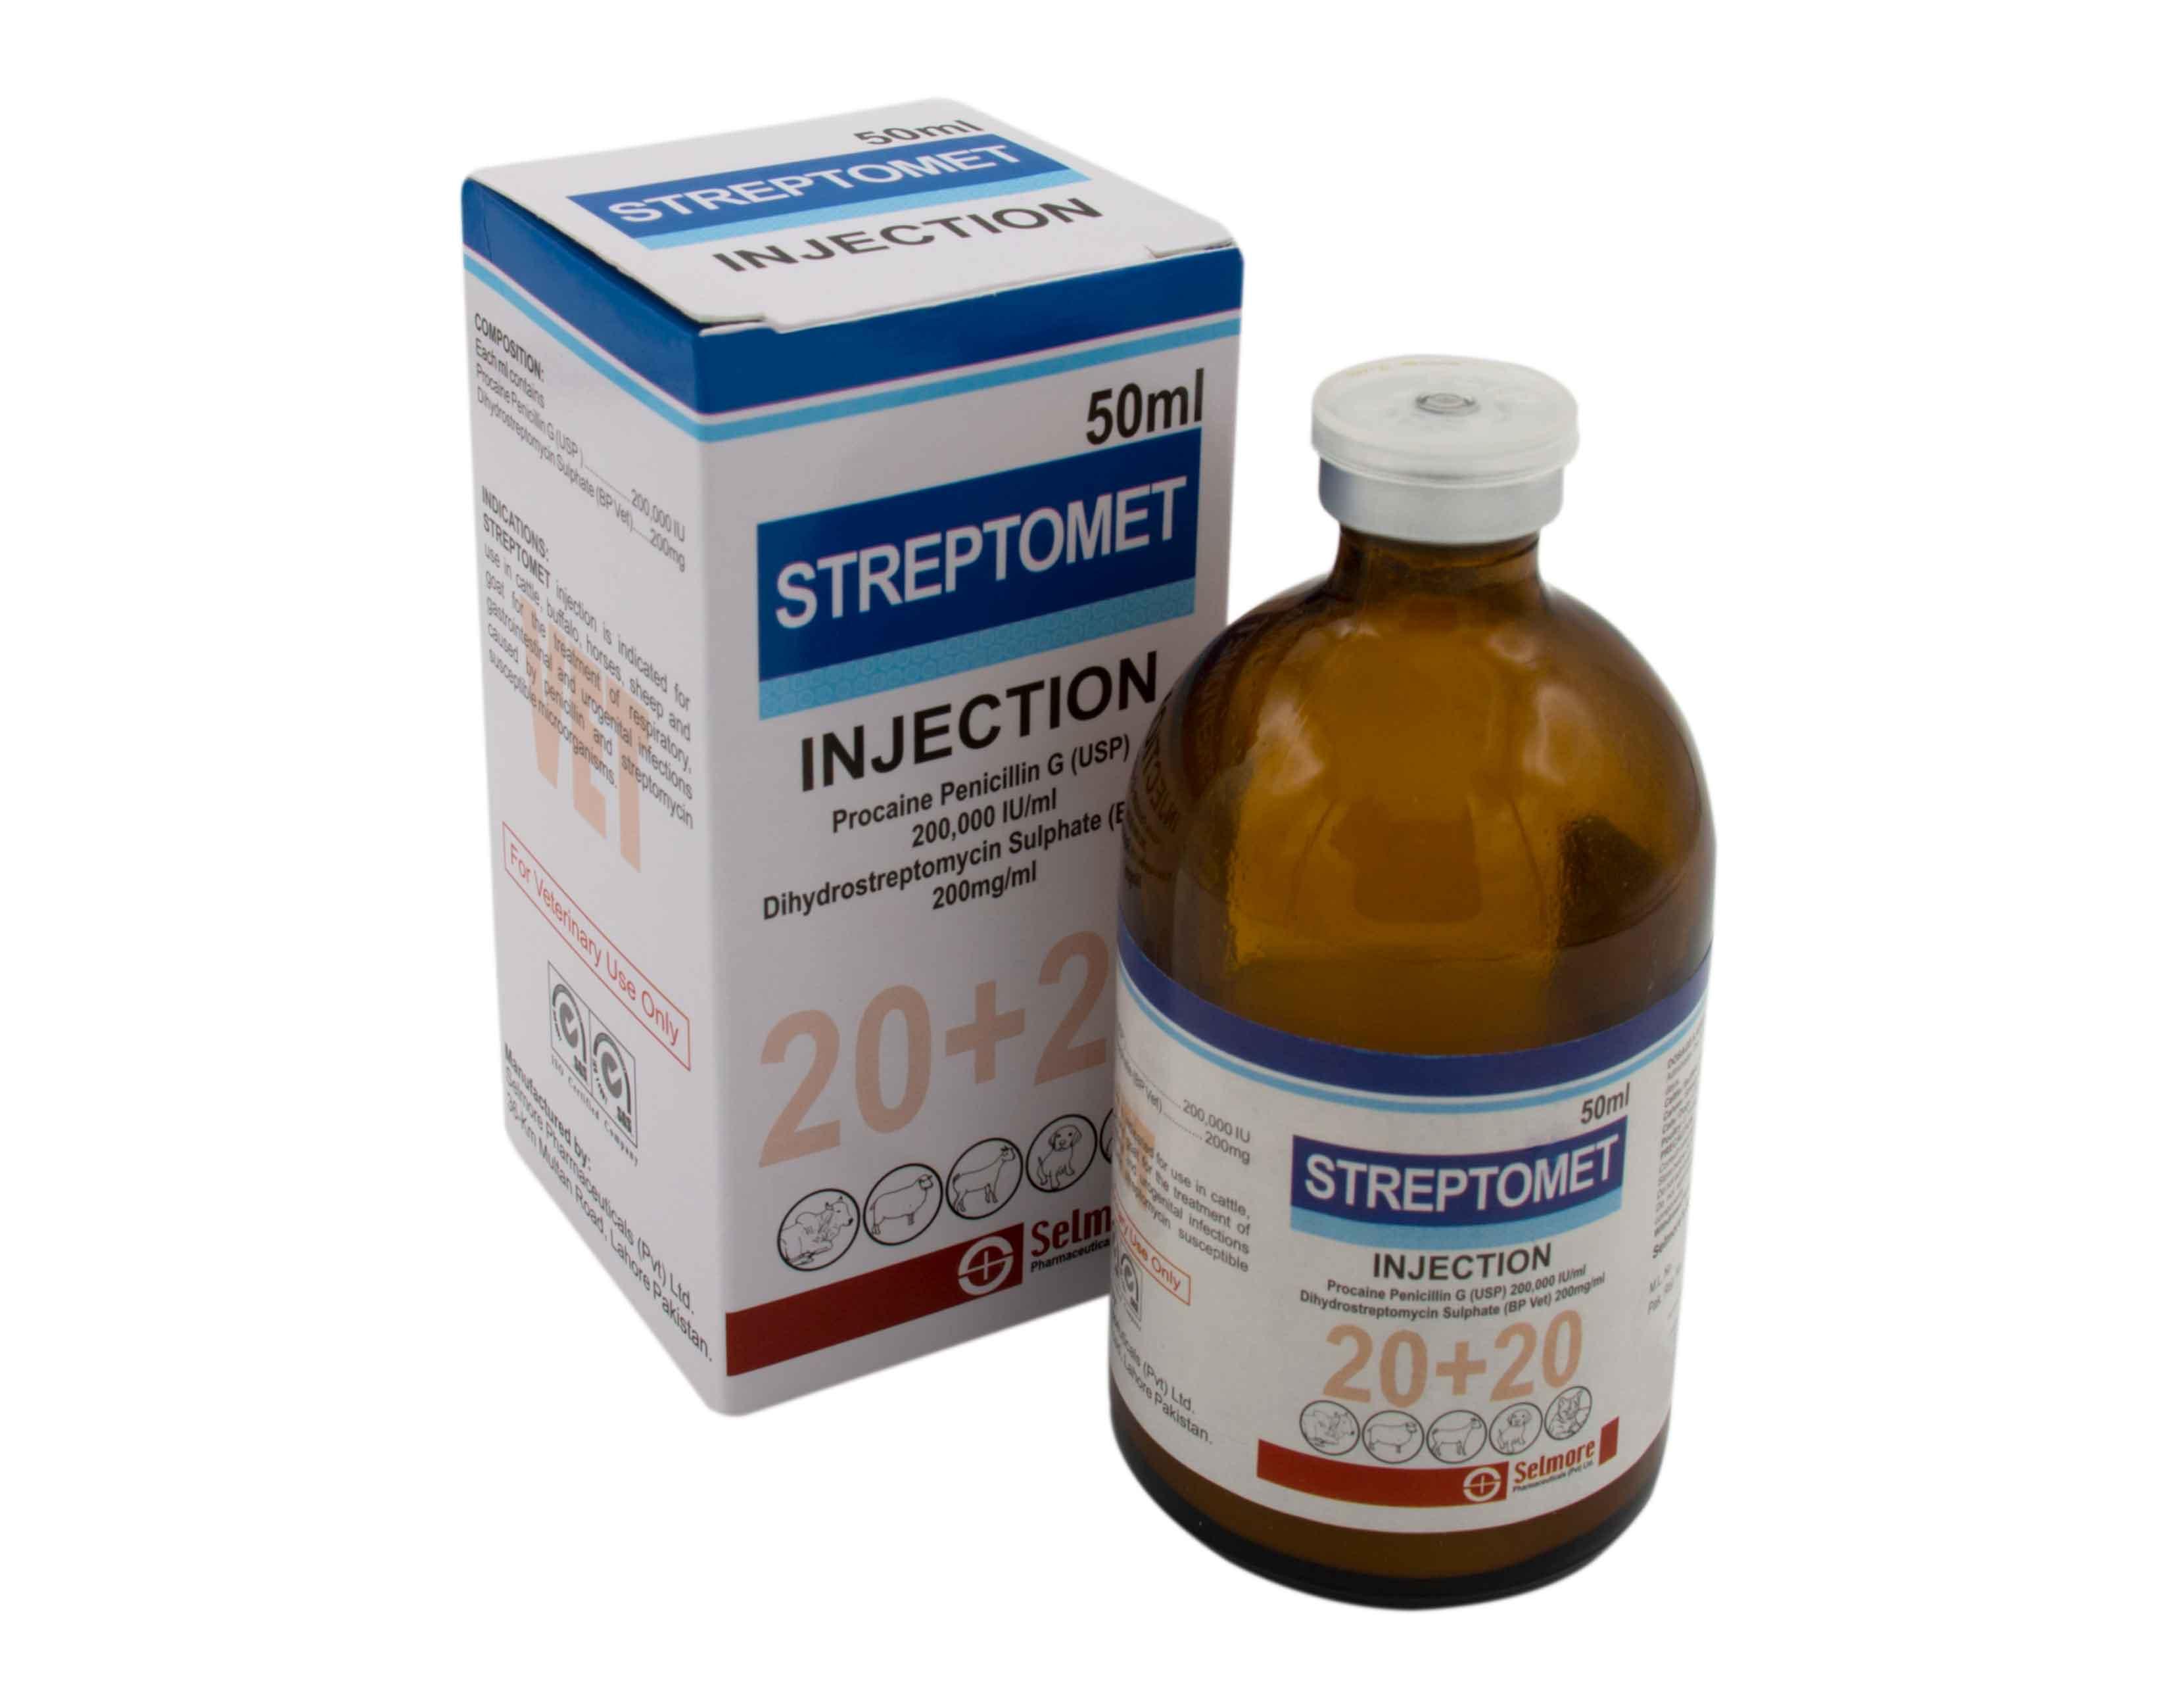 Streptomet Injection